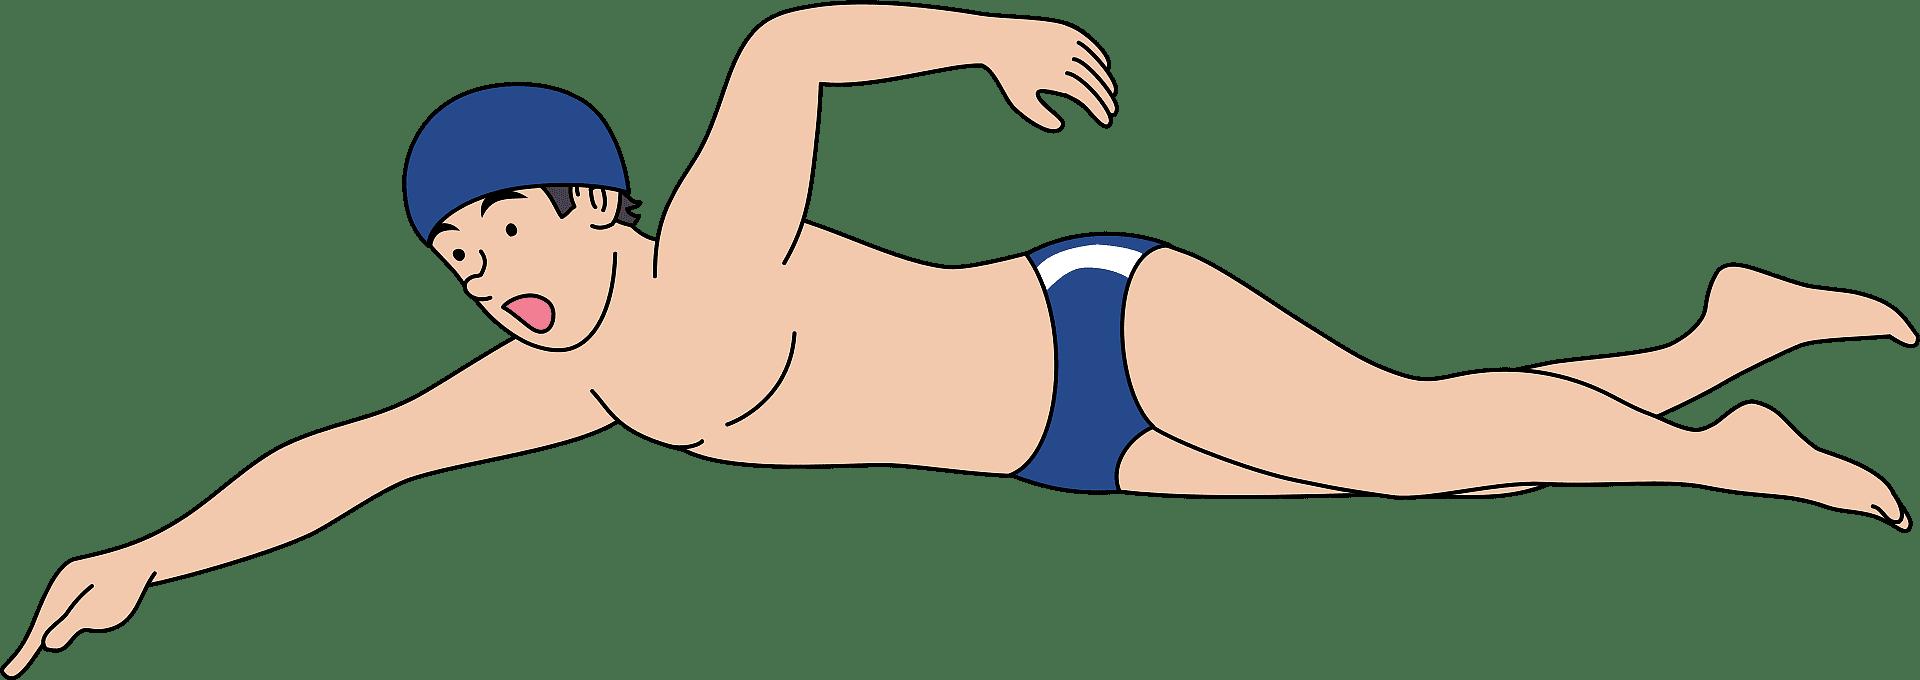 Swimming clipart transparent 10